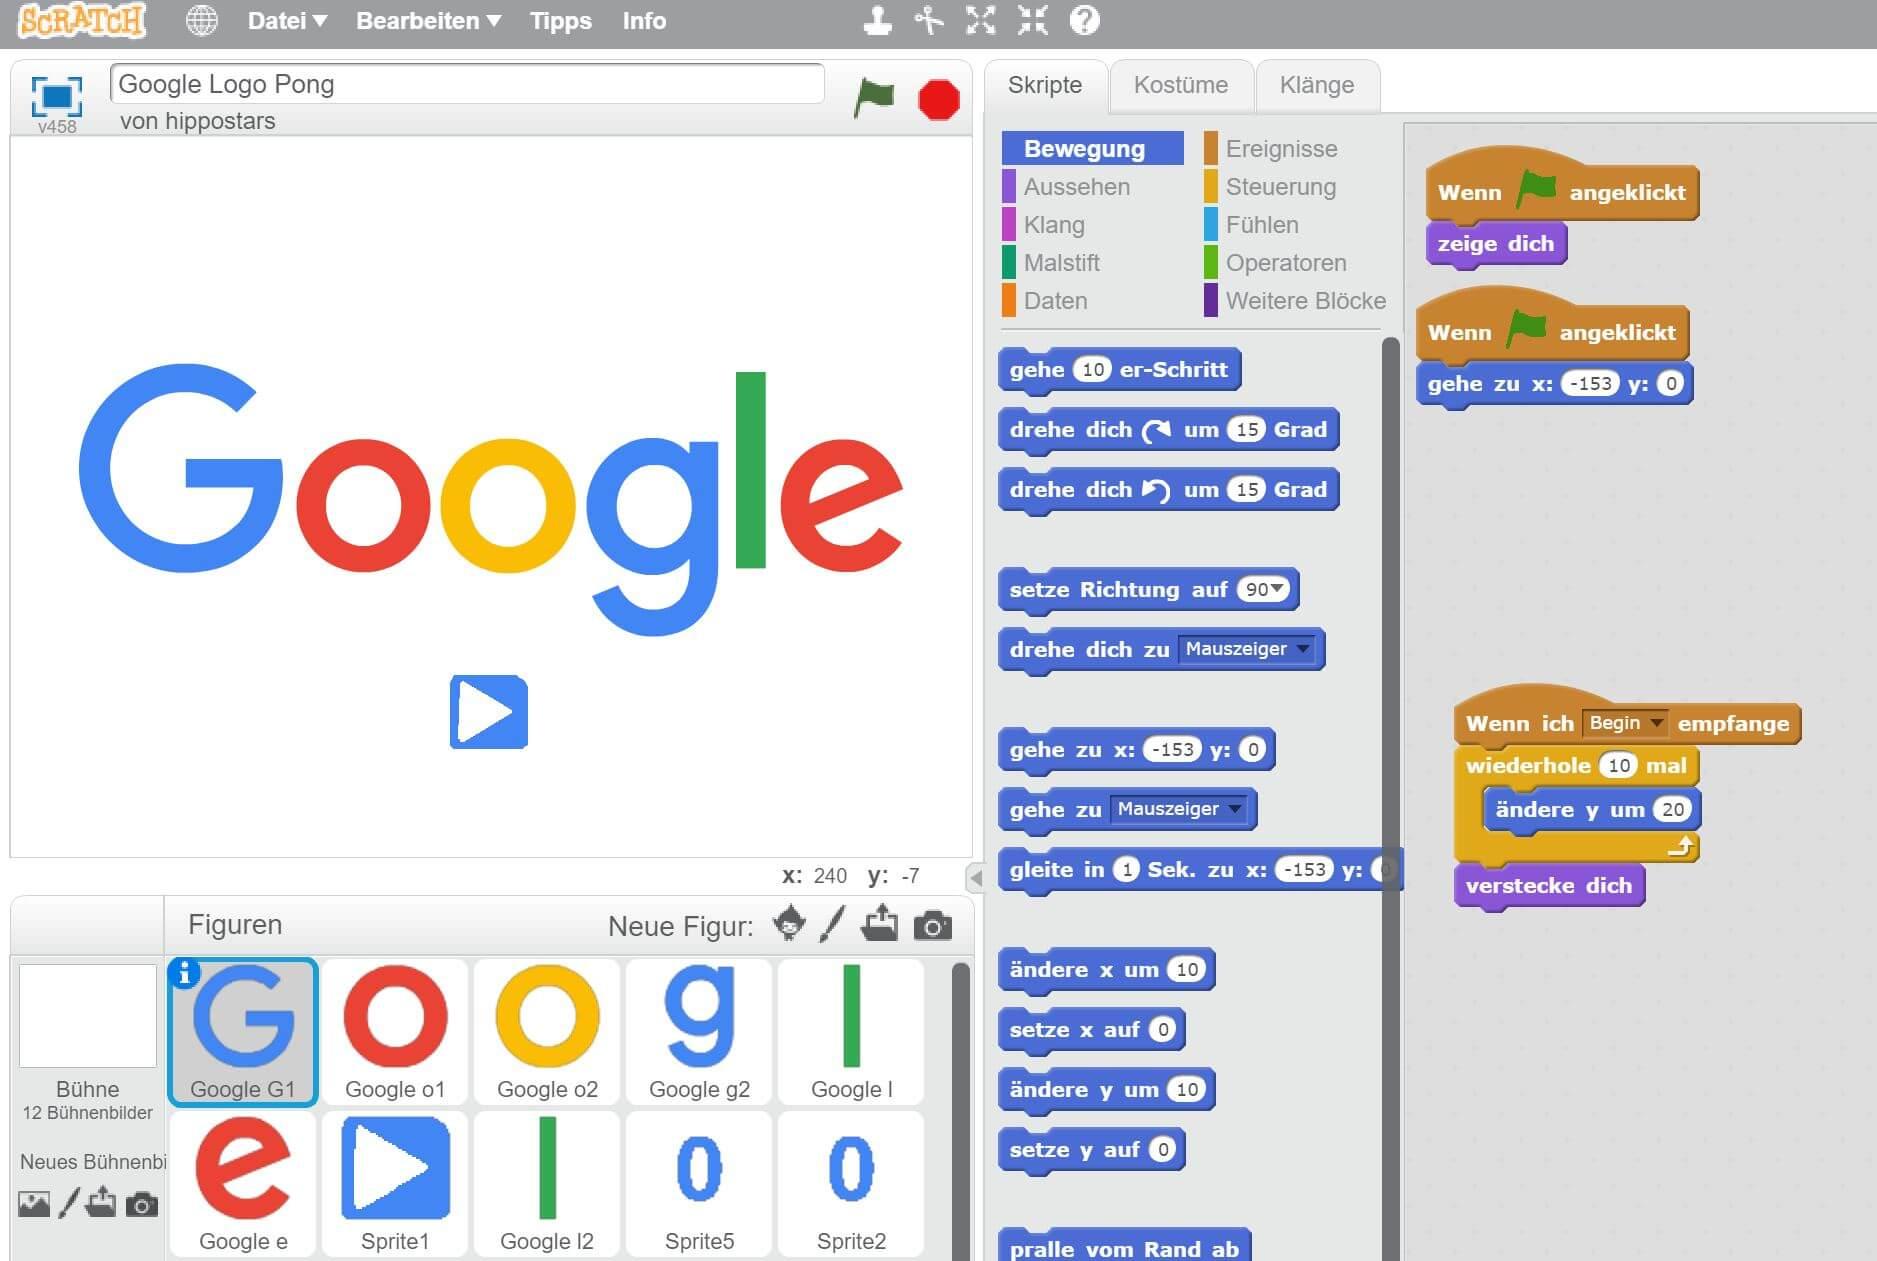 google logo pong